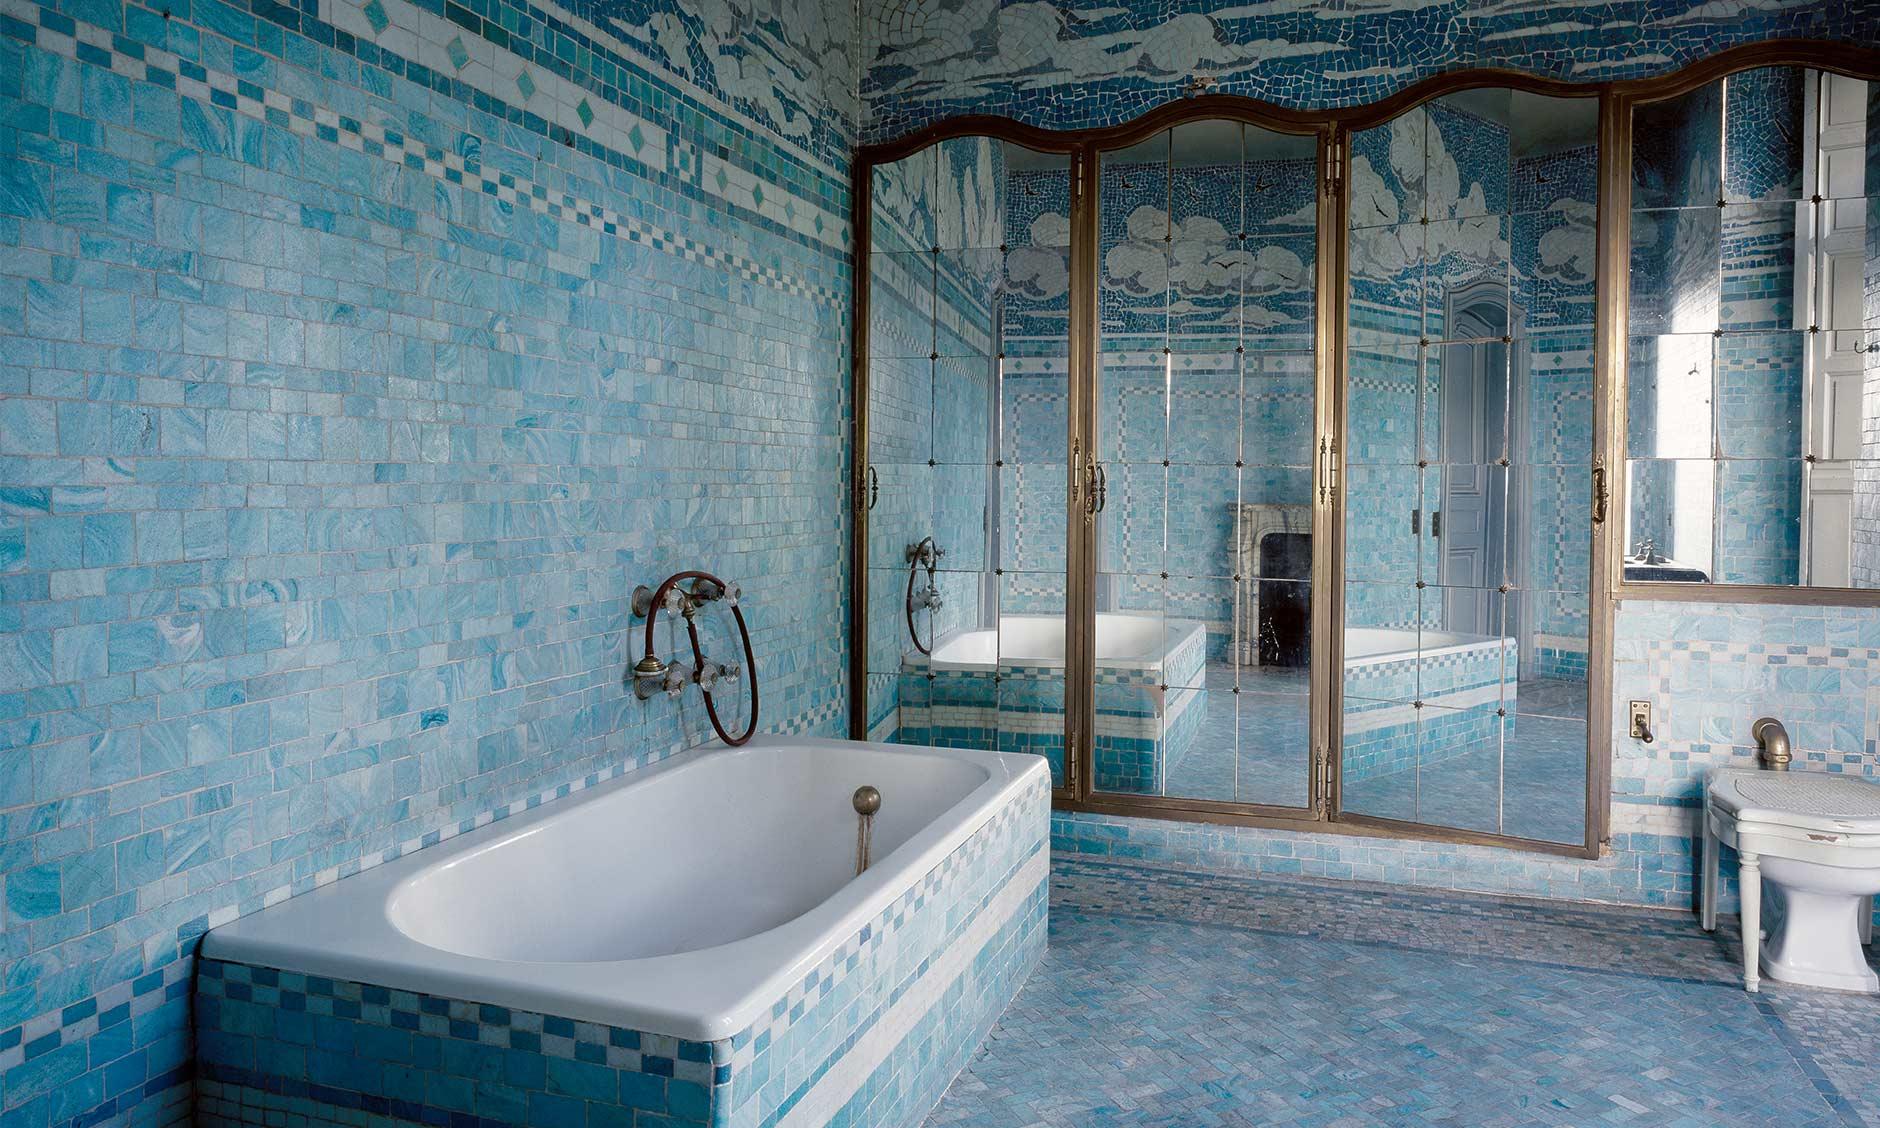 baño6_mundos_25032019